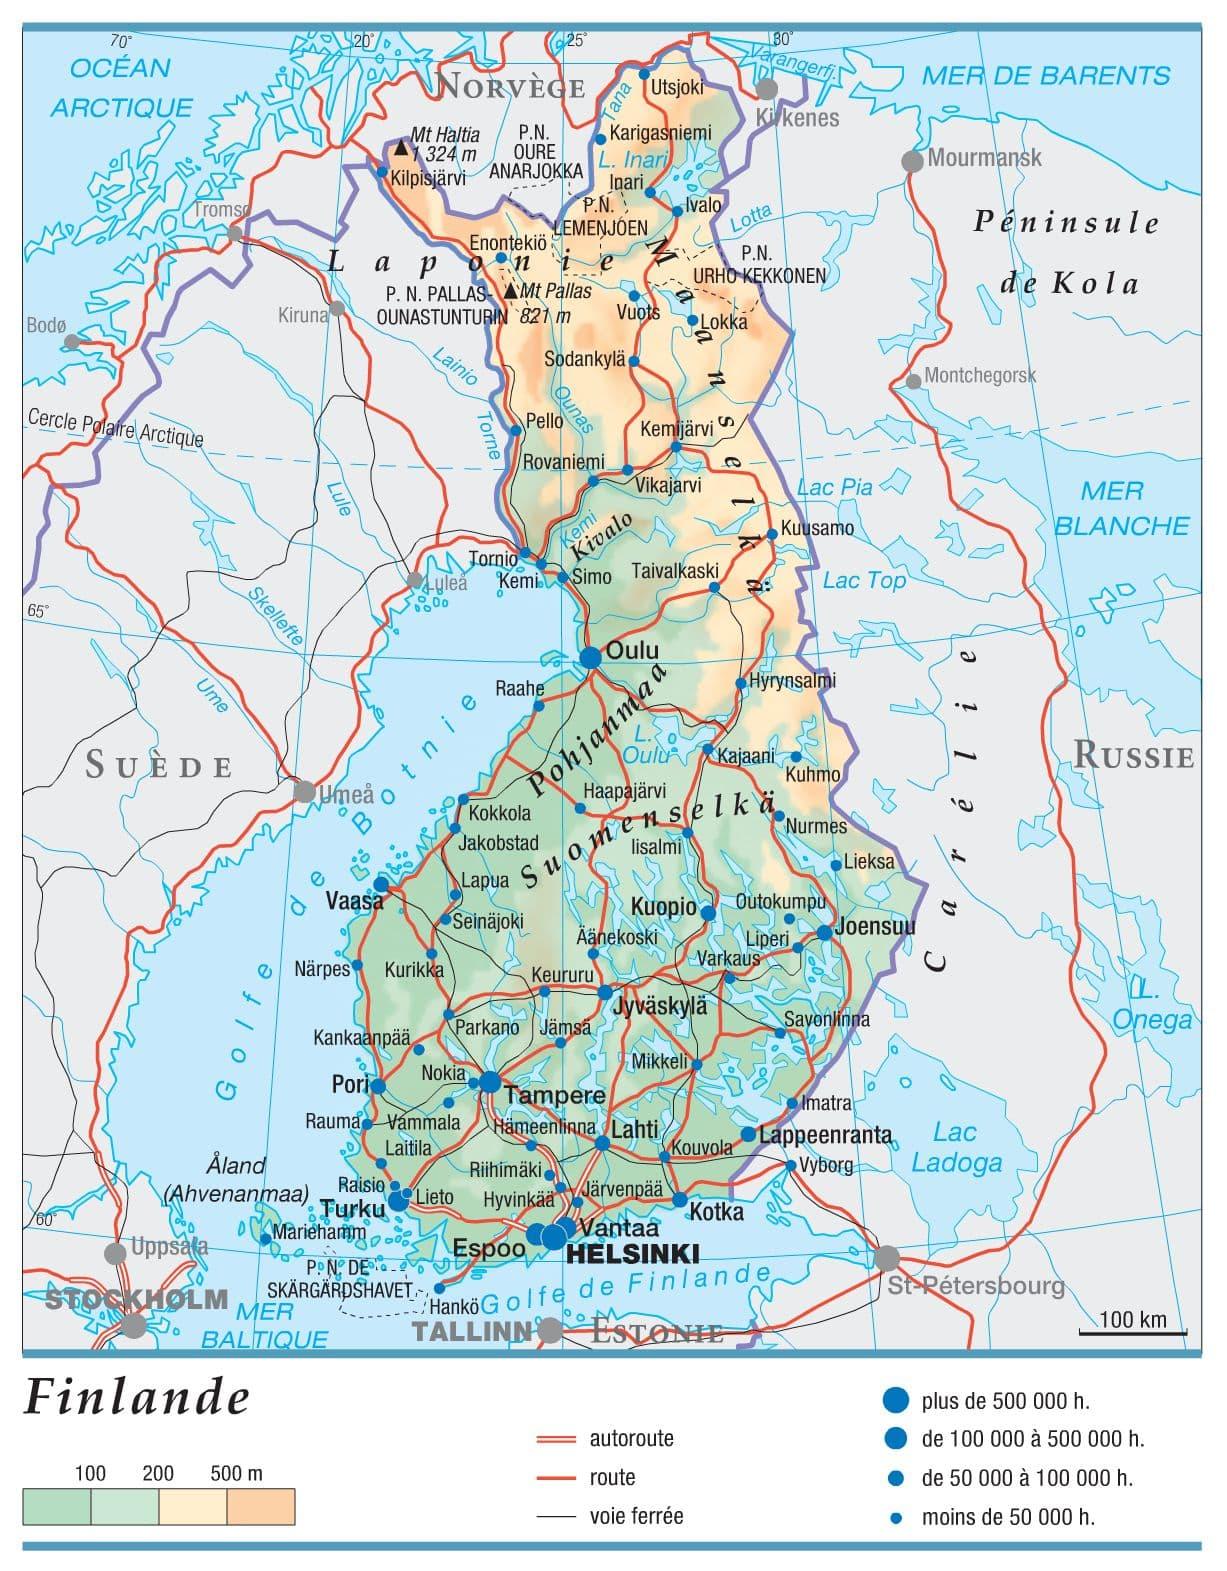 Super Encyclopédie Larousse en ligne - Finlande JW24